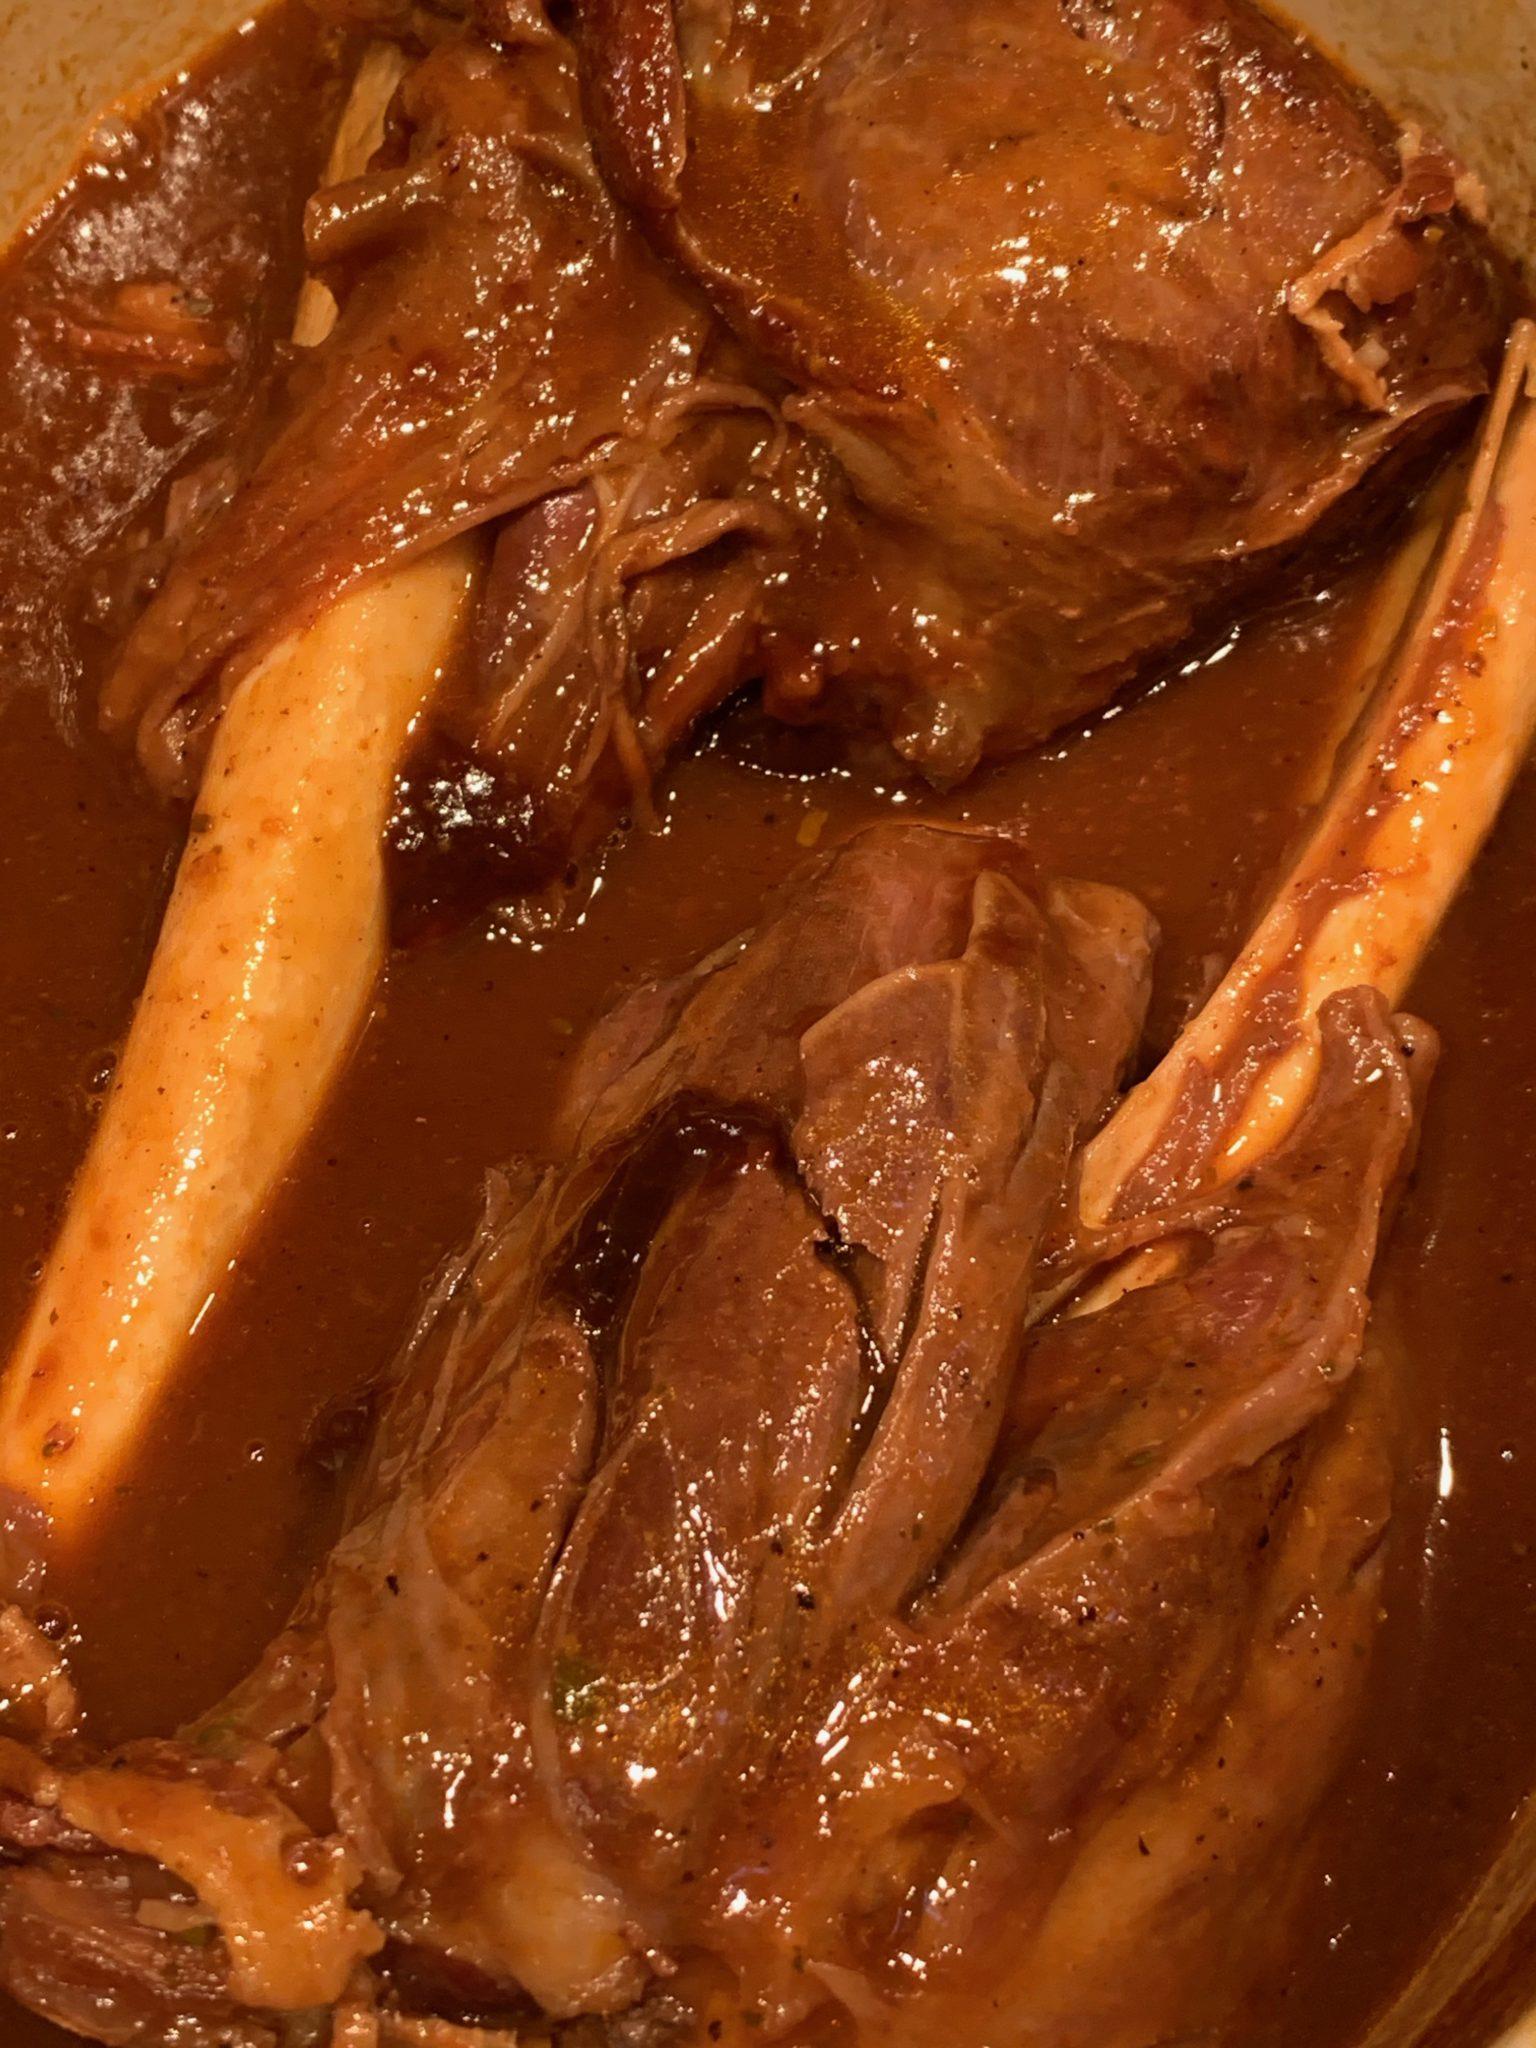 Lamb shanks cooked until tender